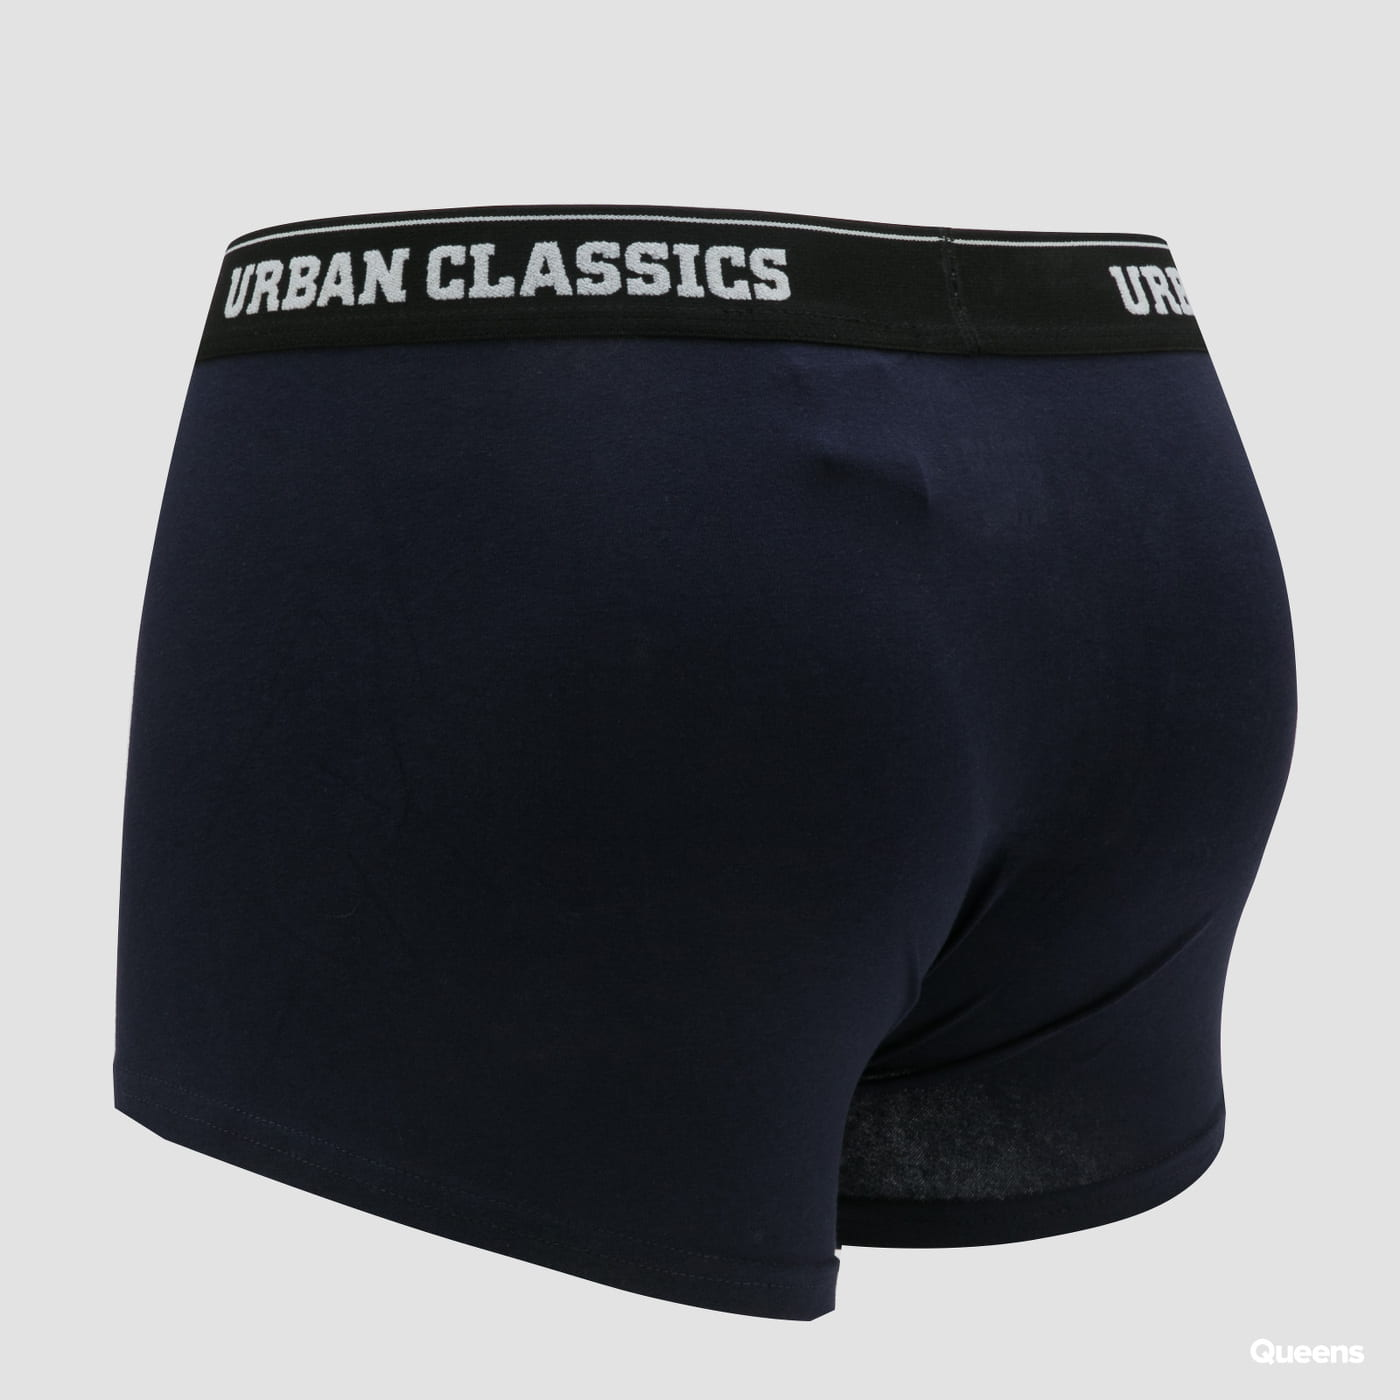 Urban Classics Organic Boxer Shorts 3-Pack white / black / navy